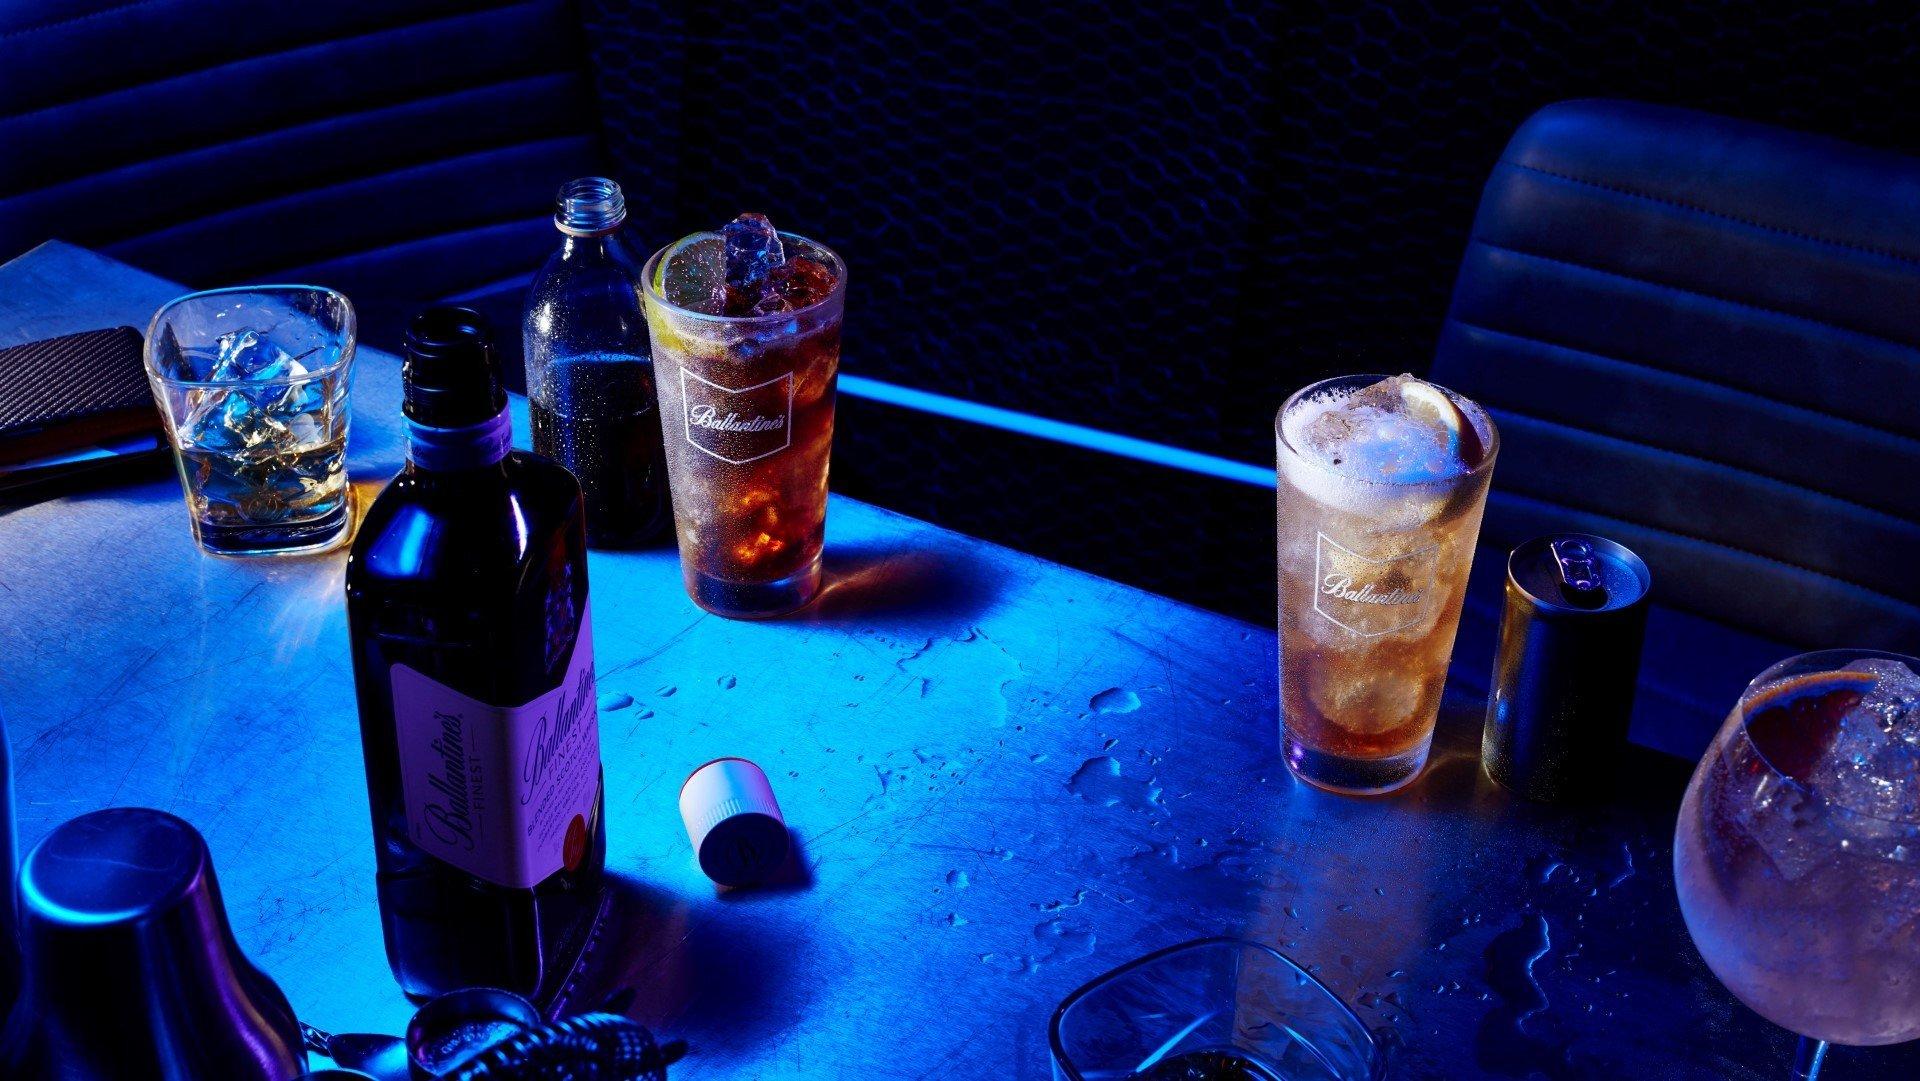 Ballantine's Finest Bottle & Drinks